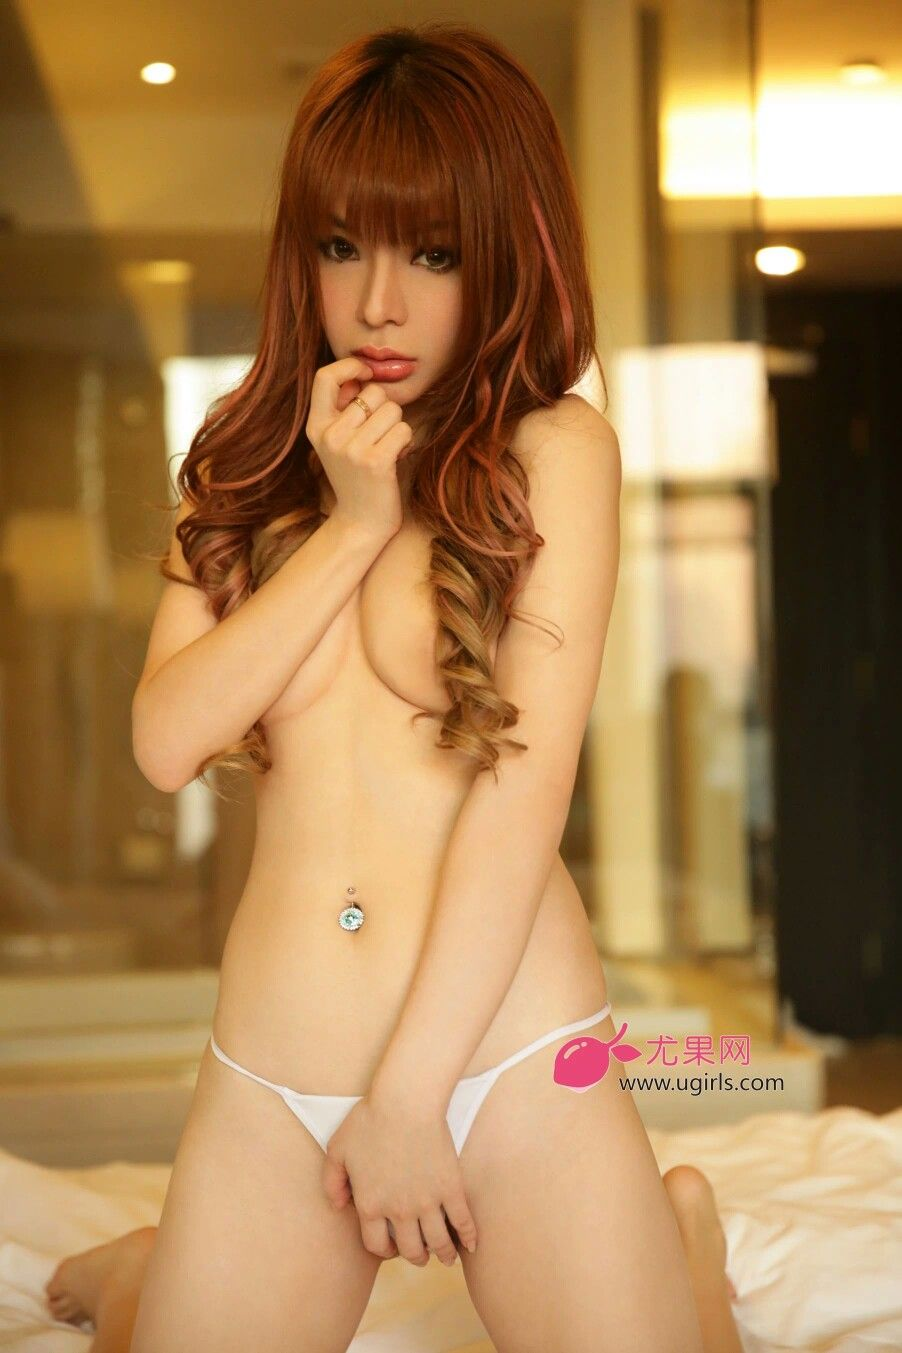 okinawa women nude